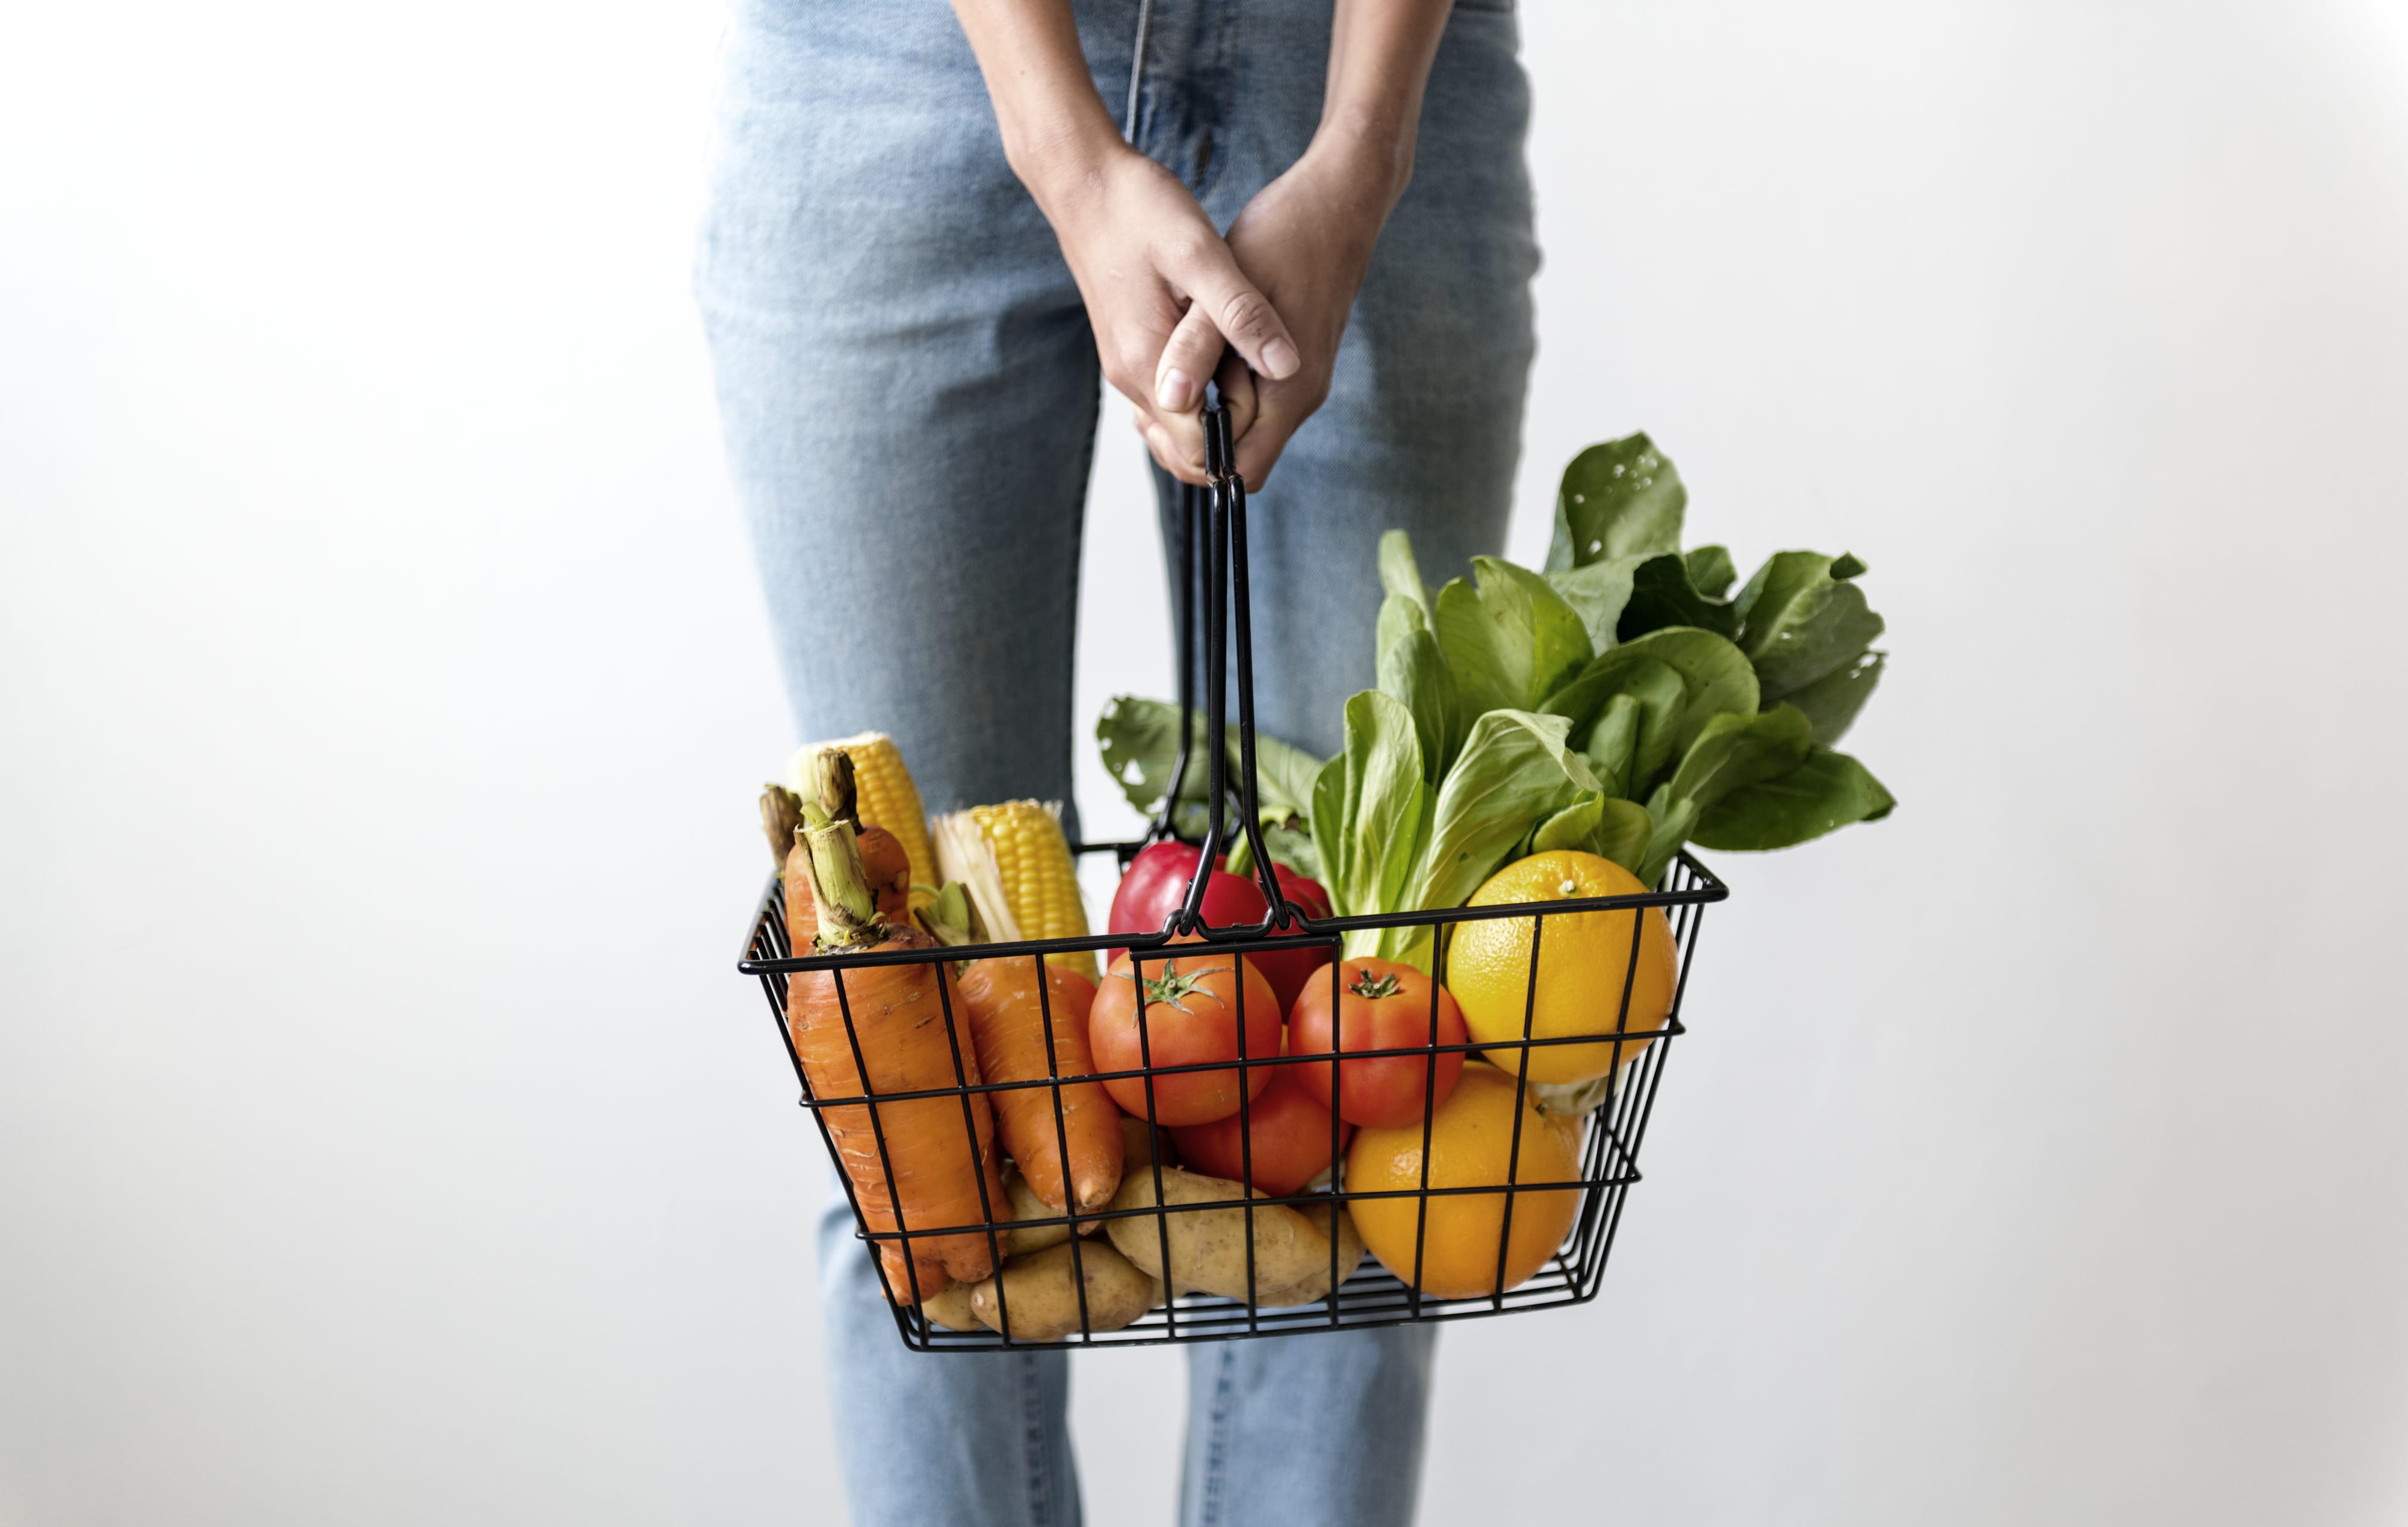 Whole Foods vs. Trader Joe's in San Francisco